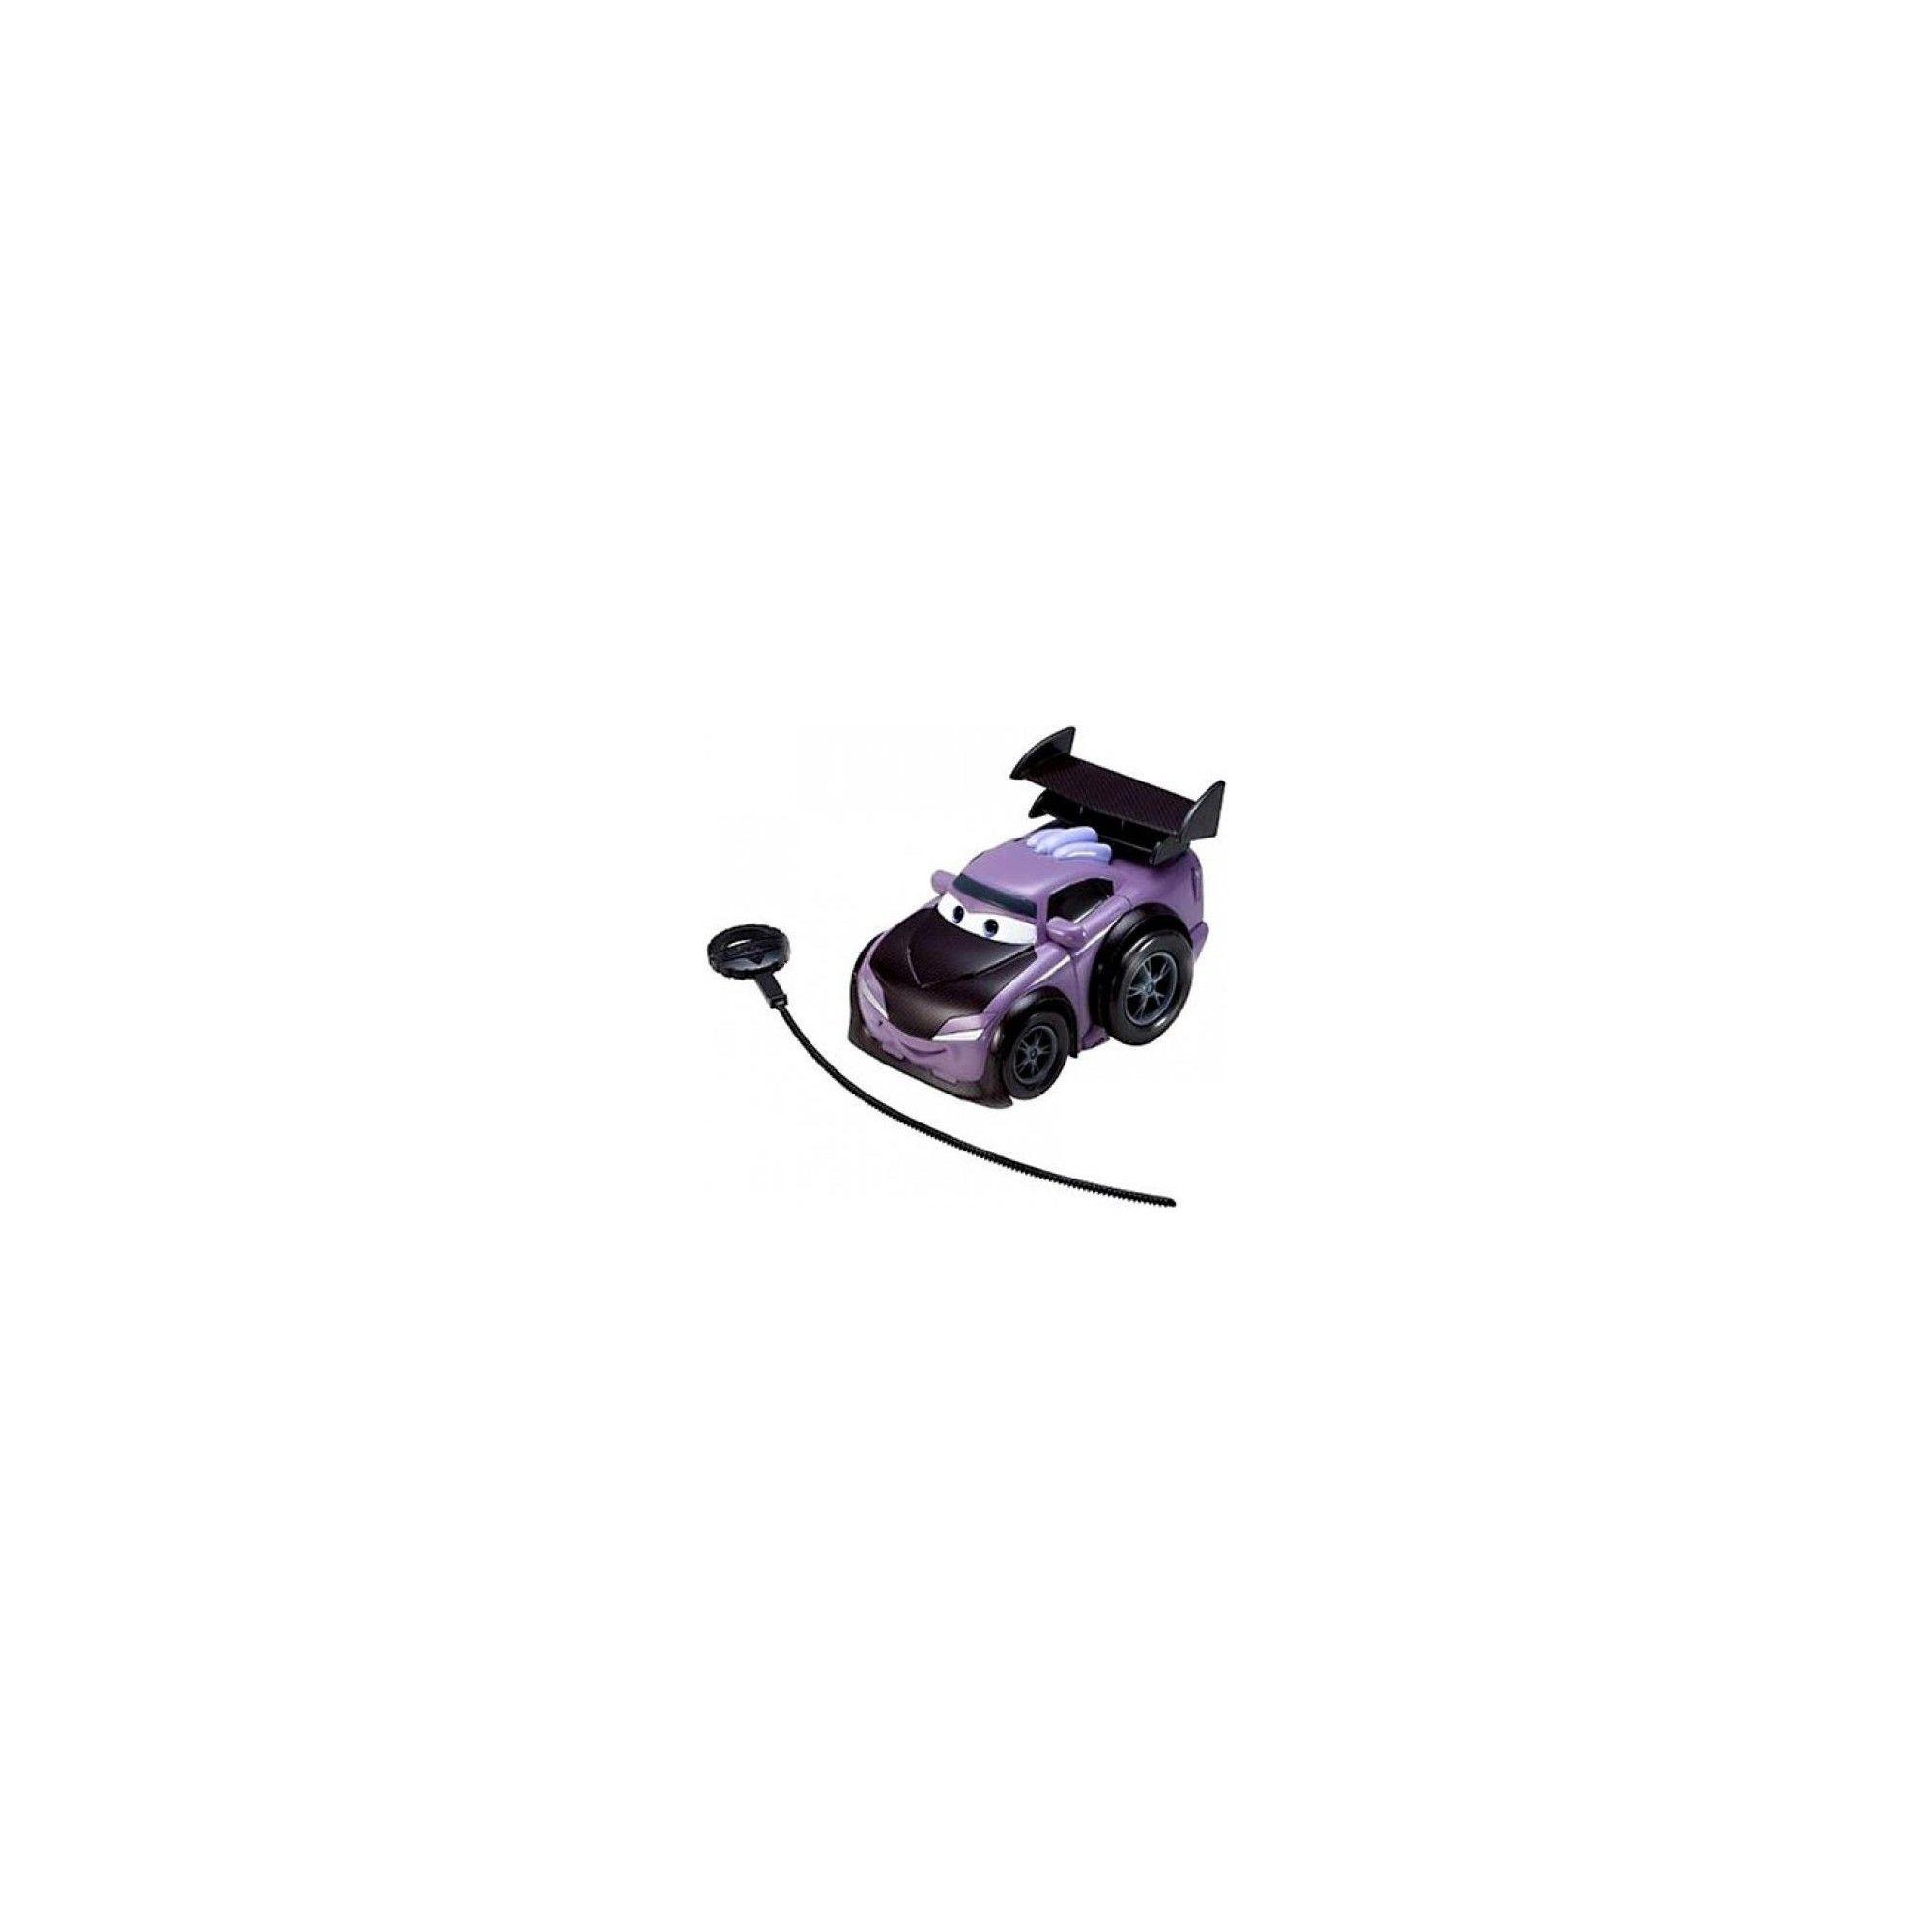 Boost Disney Cars Rip Stick Racer